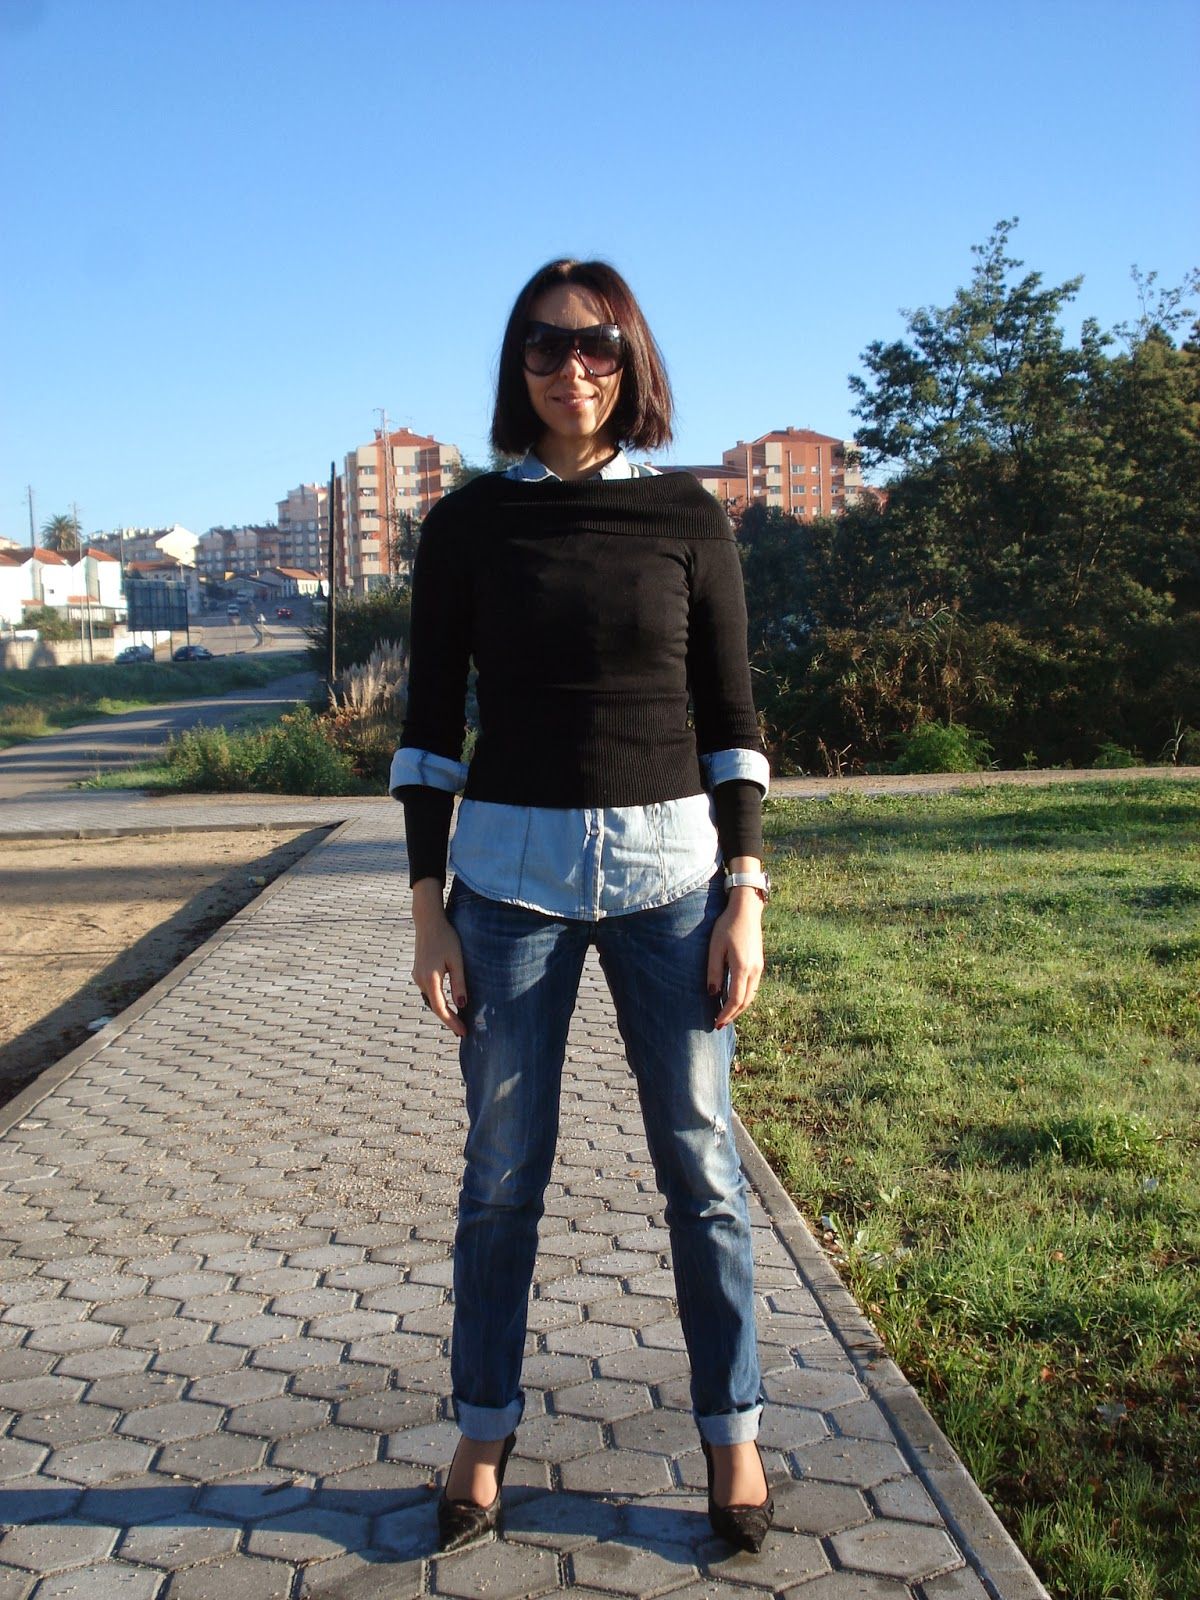 moda, sapatinho, sapato, shoe, trend, trending, fashion, moda, style, estilo, look